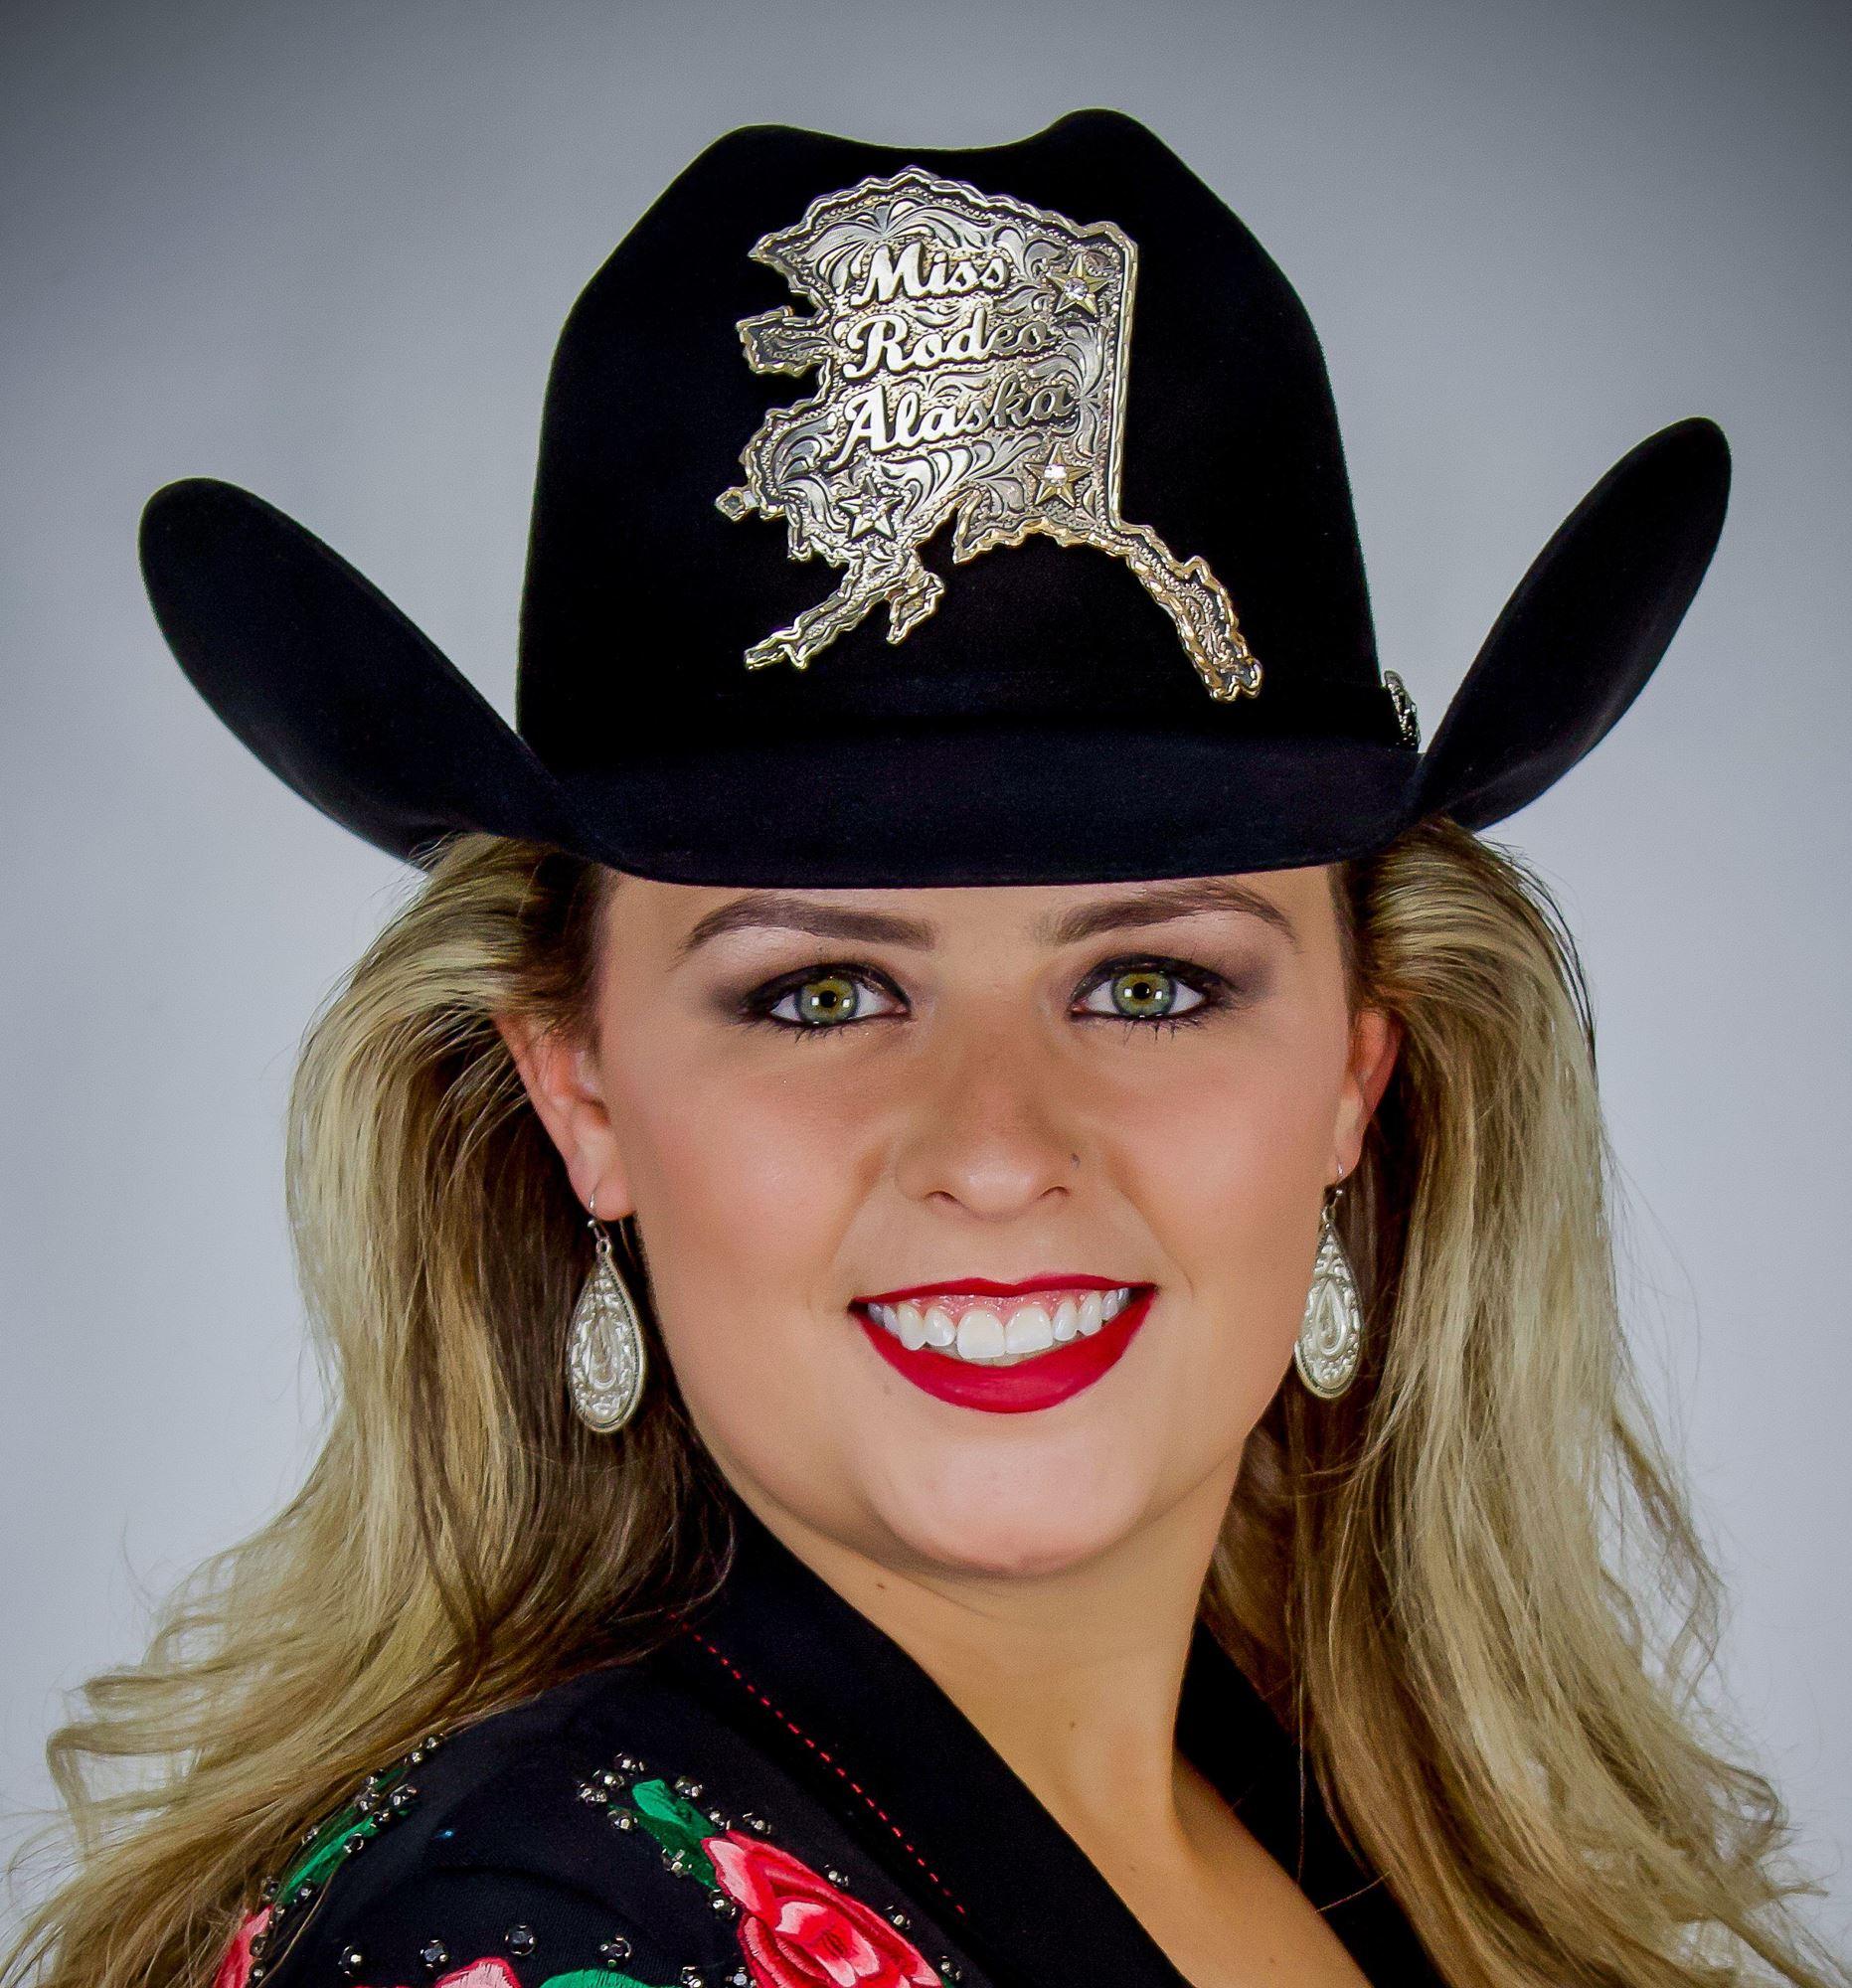 Miss Rodeo America 2020 Contestants